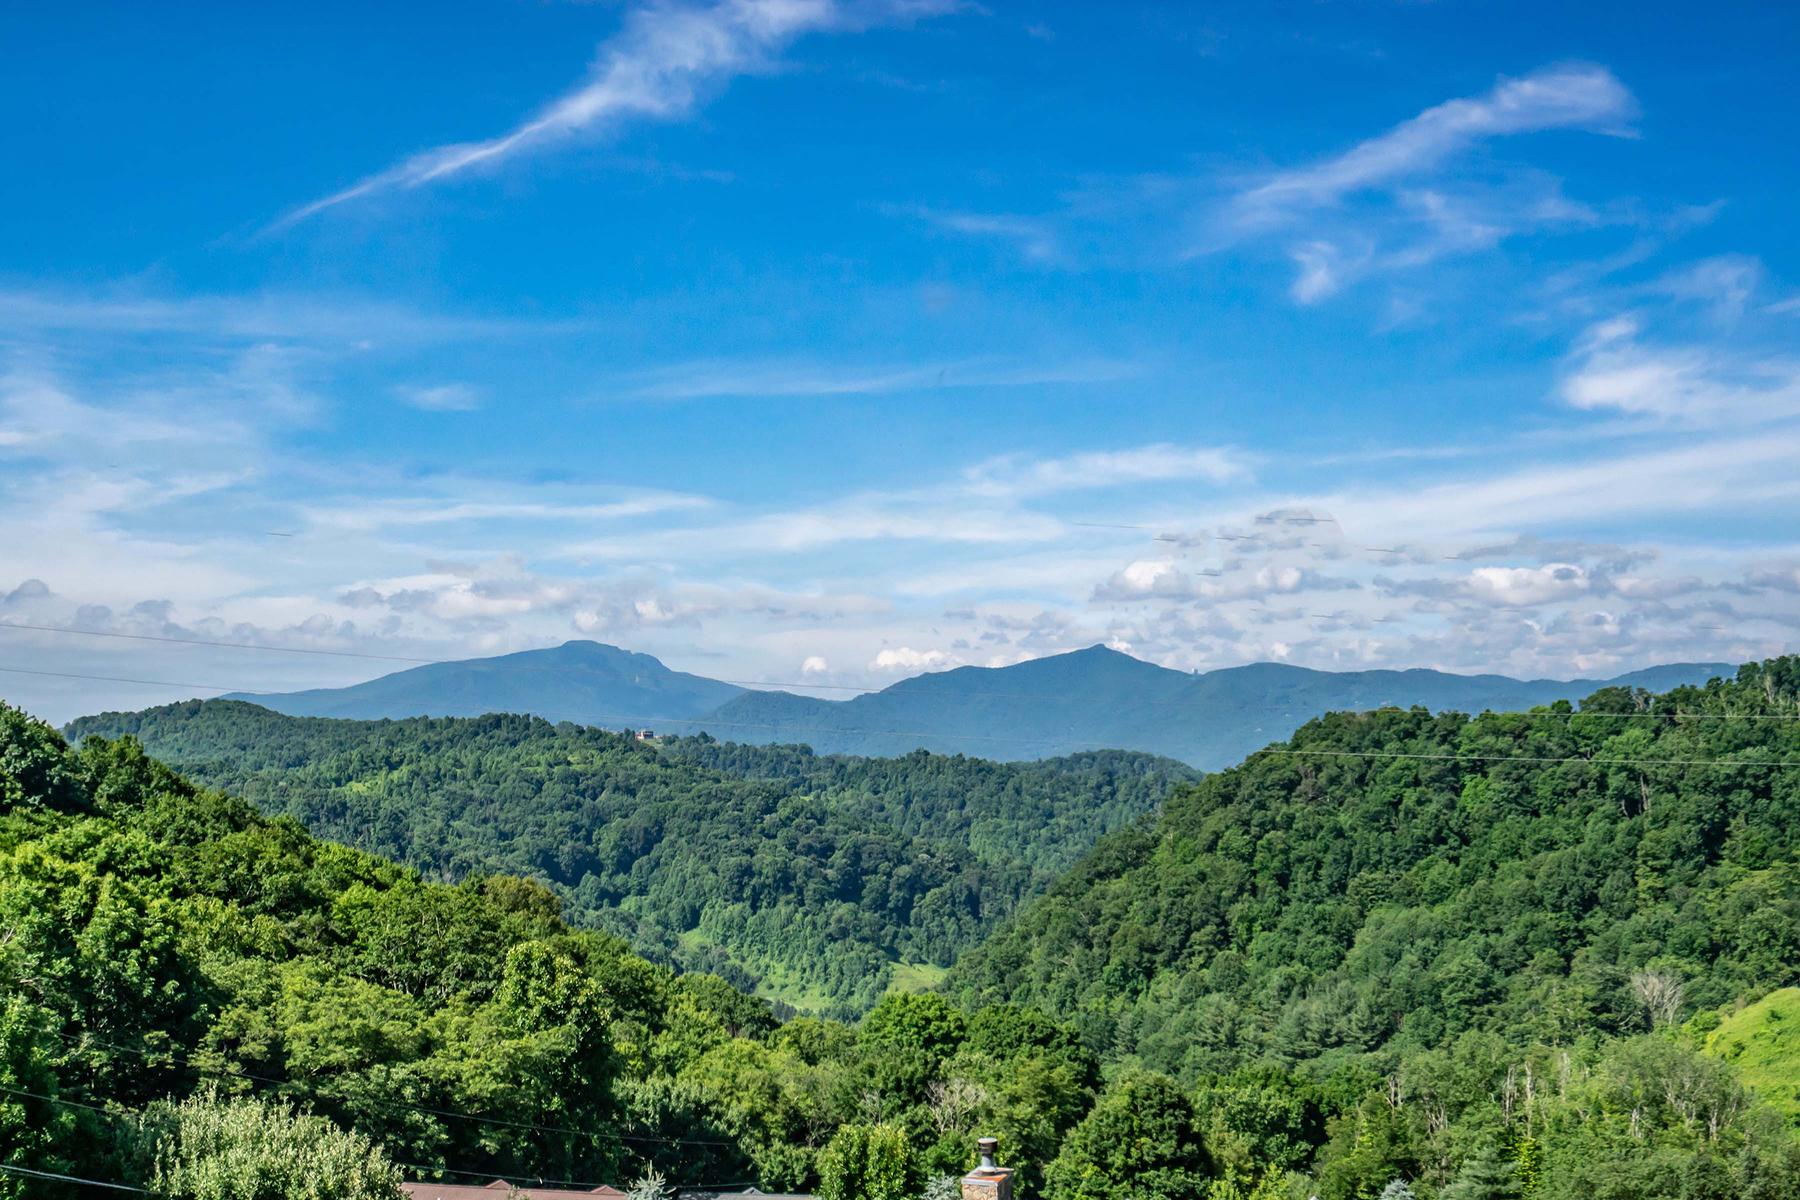 Single Family Homes for Active at GF BINGHAM - VILAS 355 Incline Dr Vilas, North Carolina 28692 United States